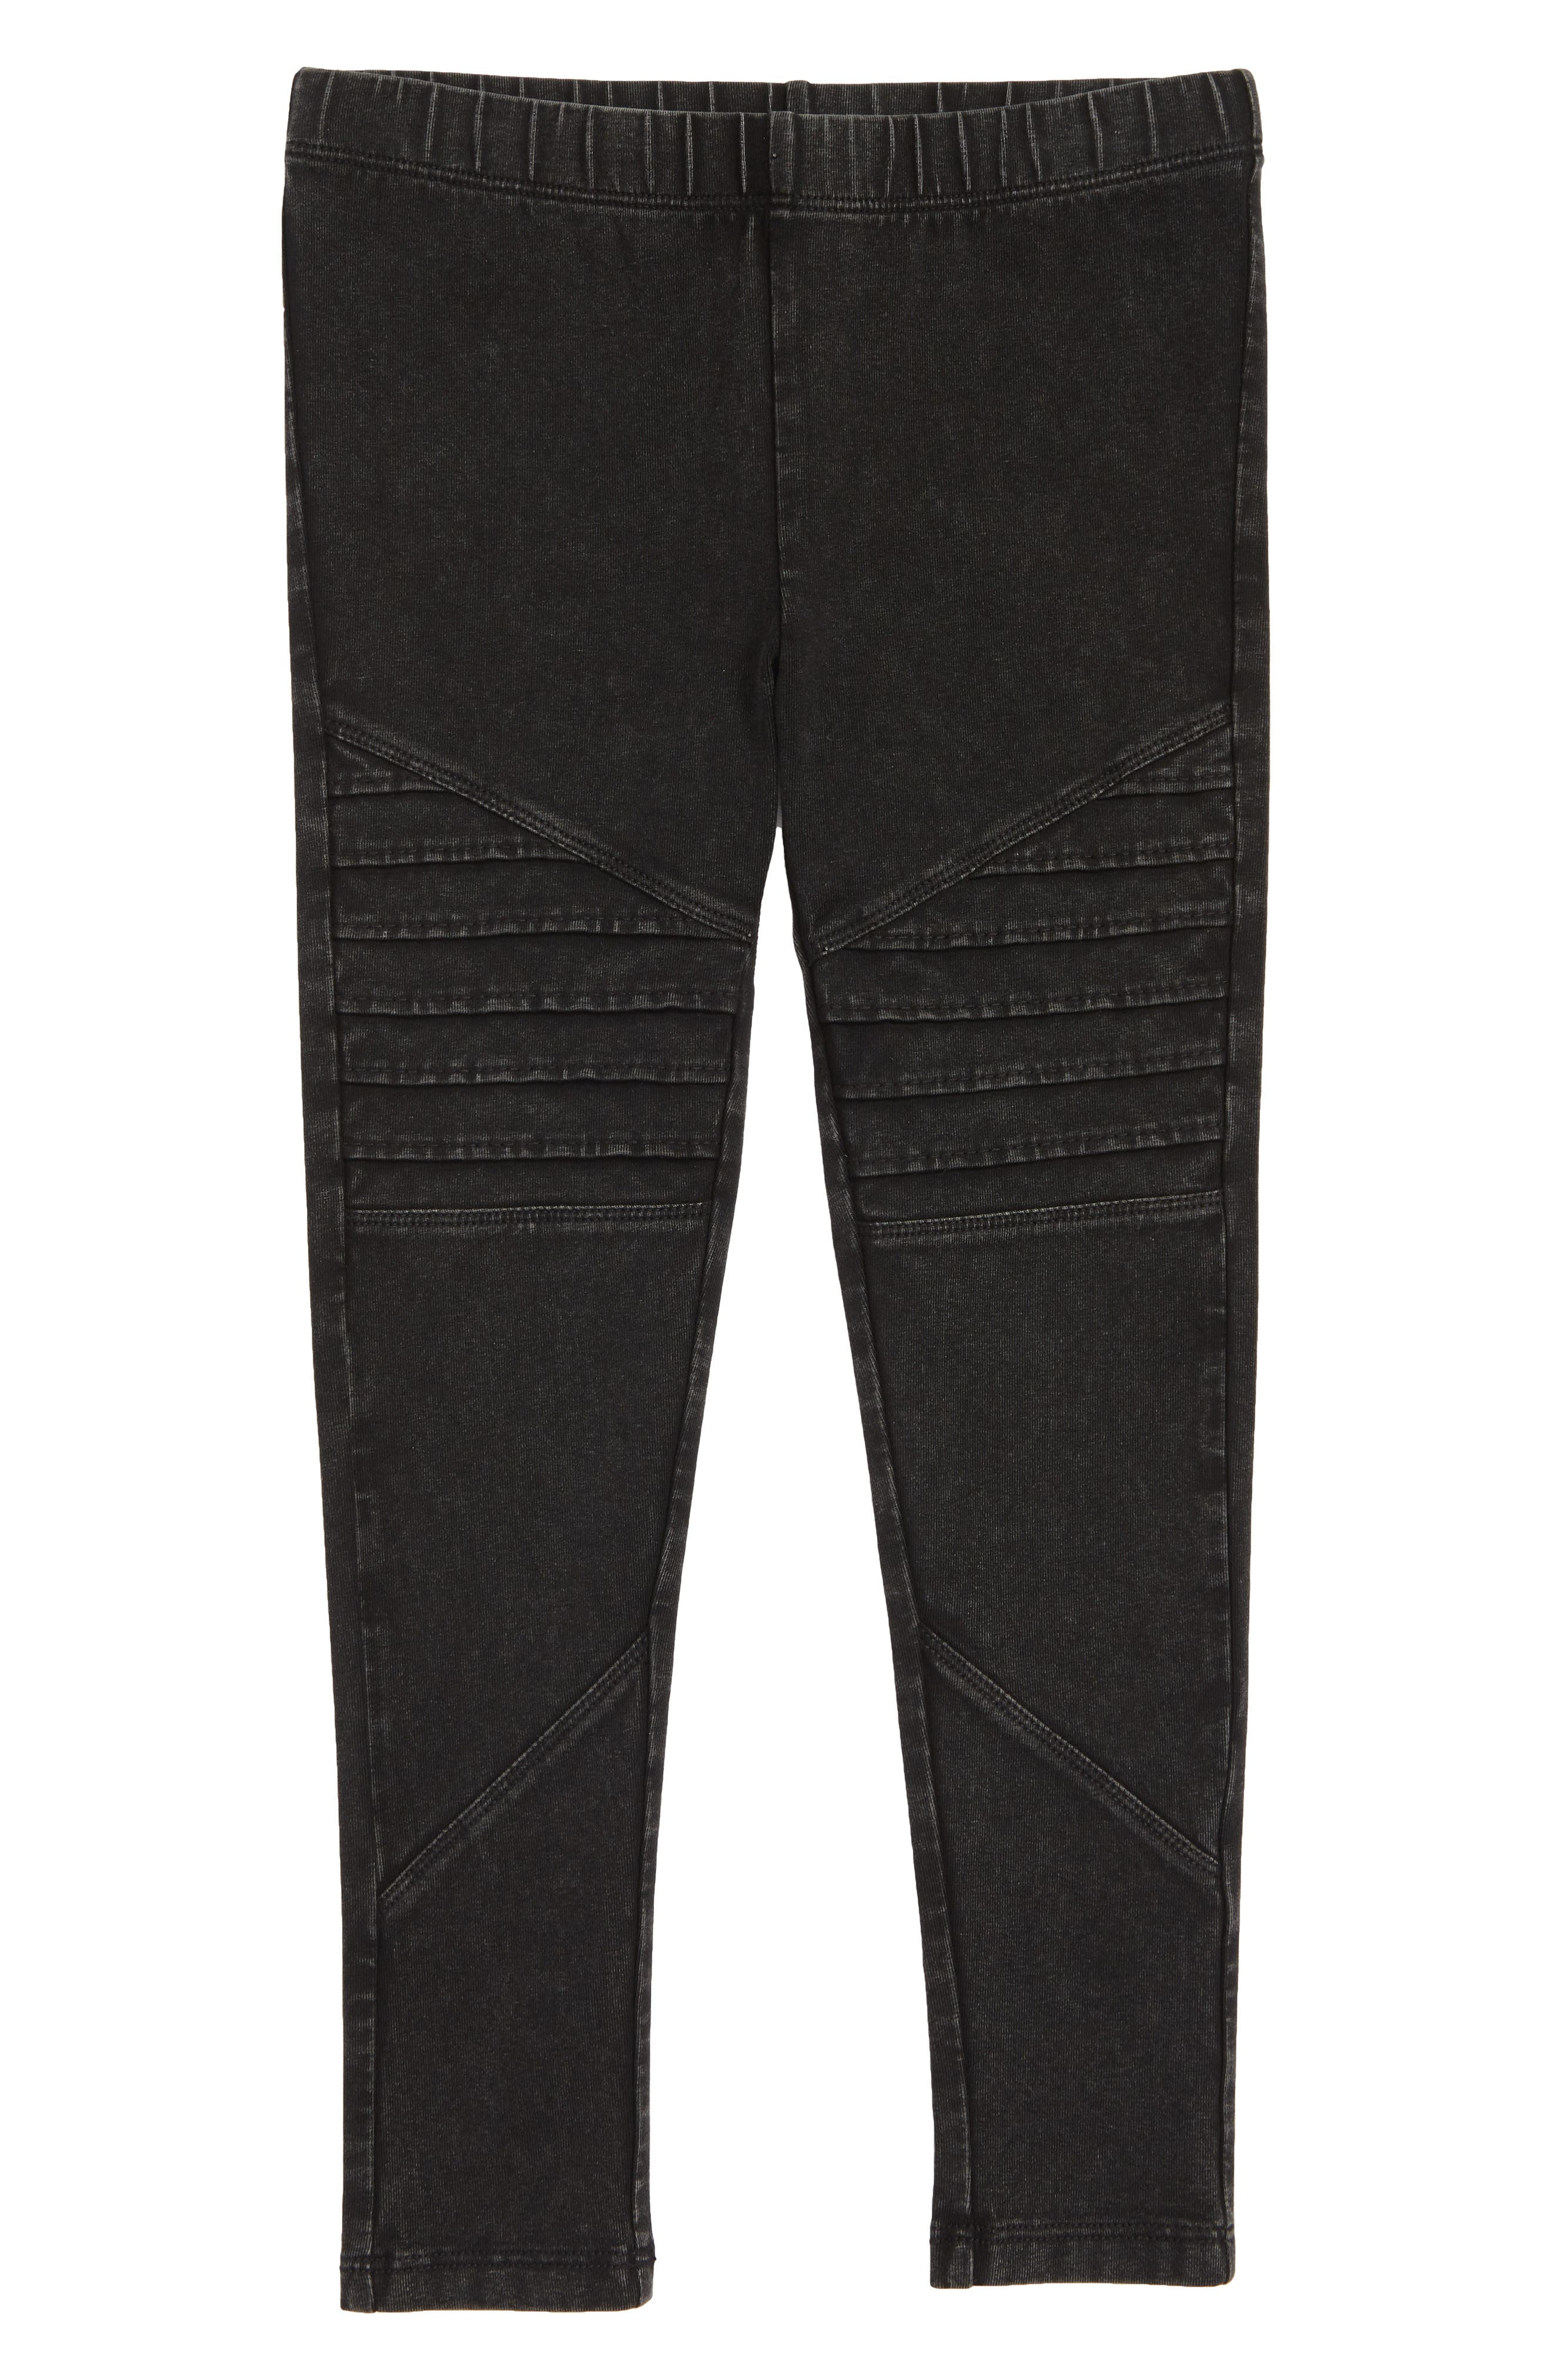 TUCKER + TATE Stretch Cotton Moto Leggings, Main, color, BLACK ROCK WASH